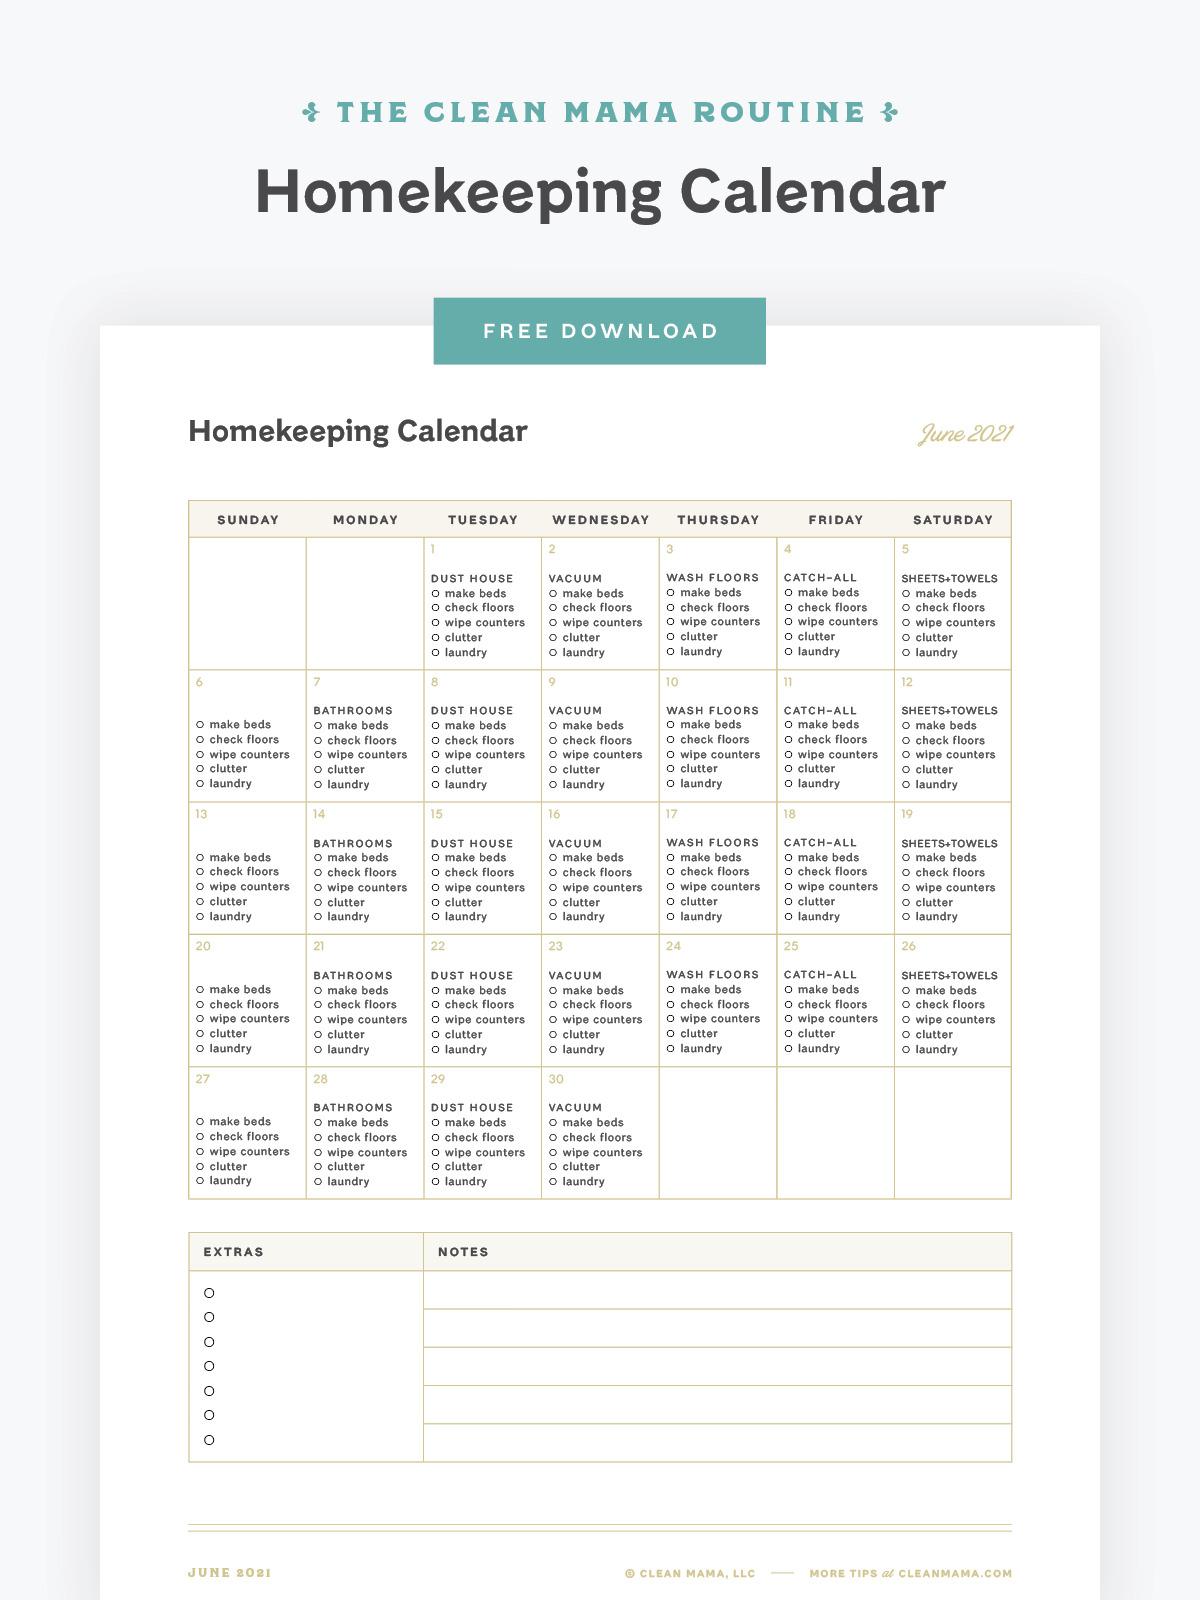 Free June 2021 Homekeeping Calendar – Clean Mama